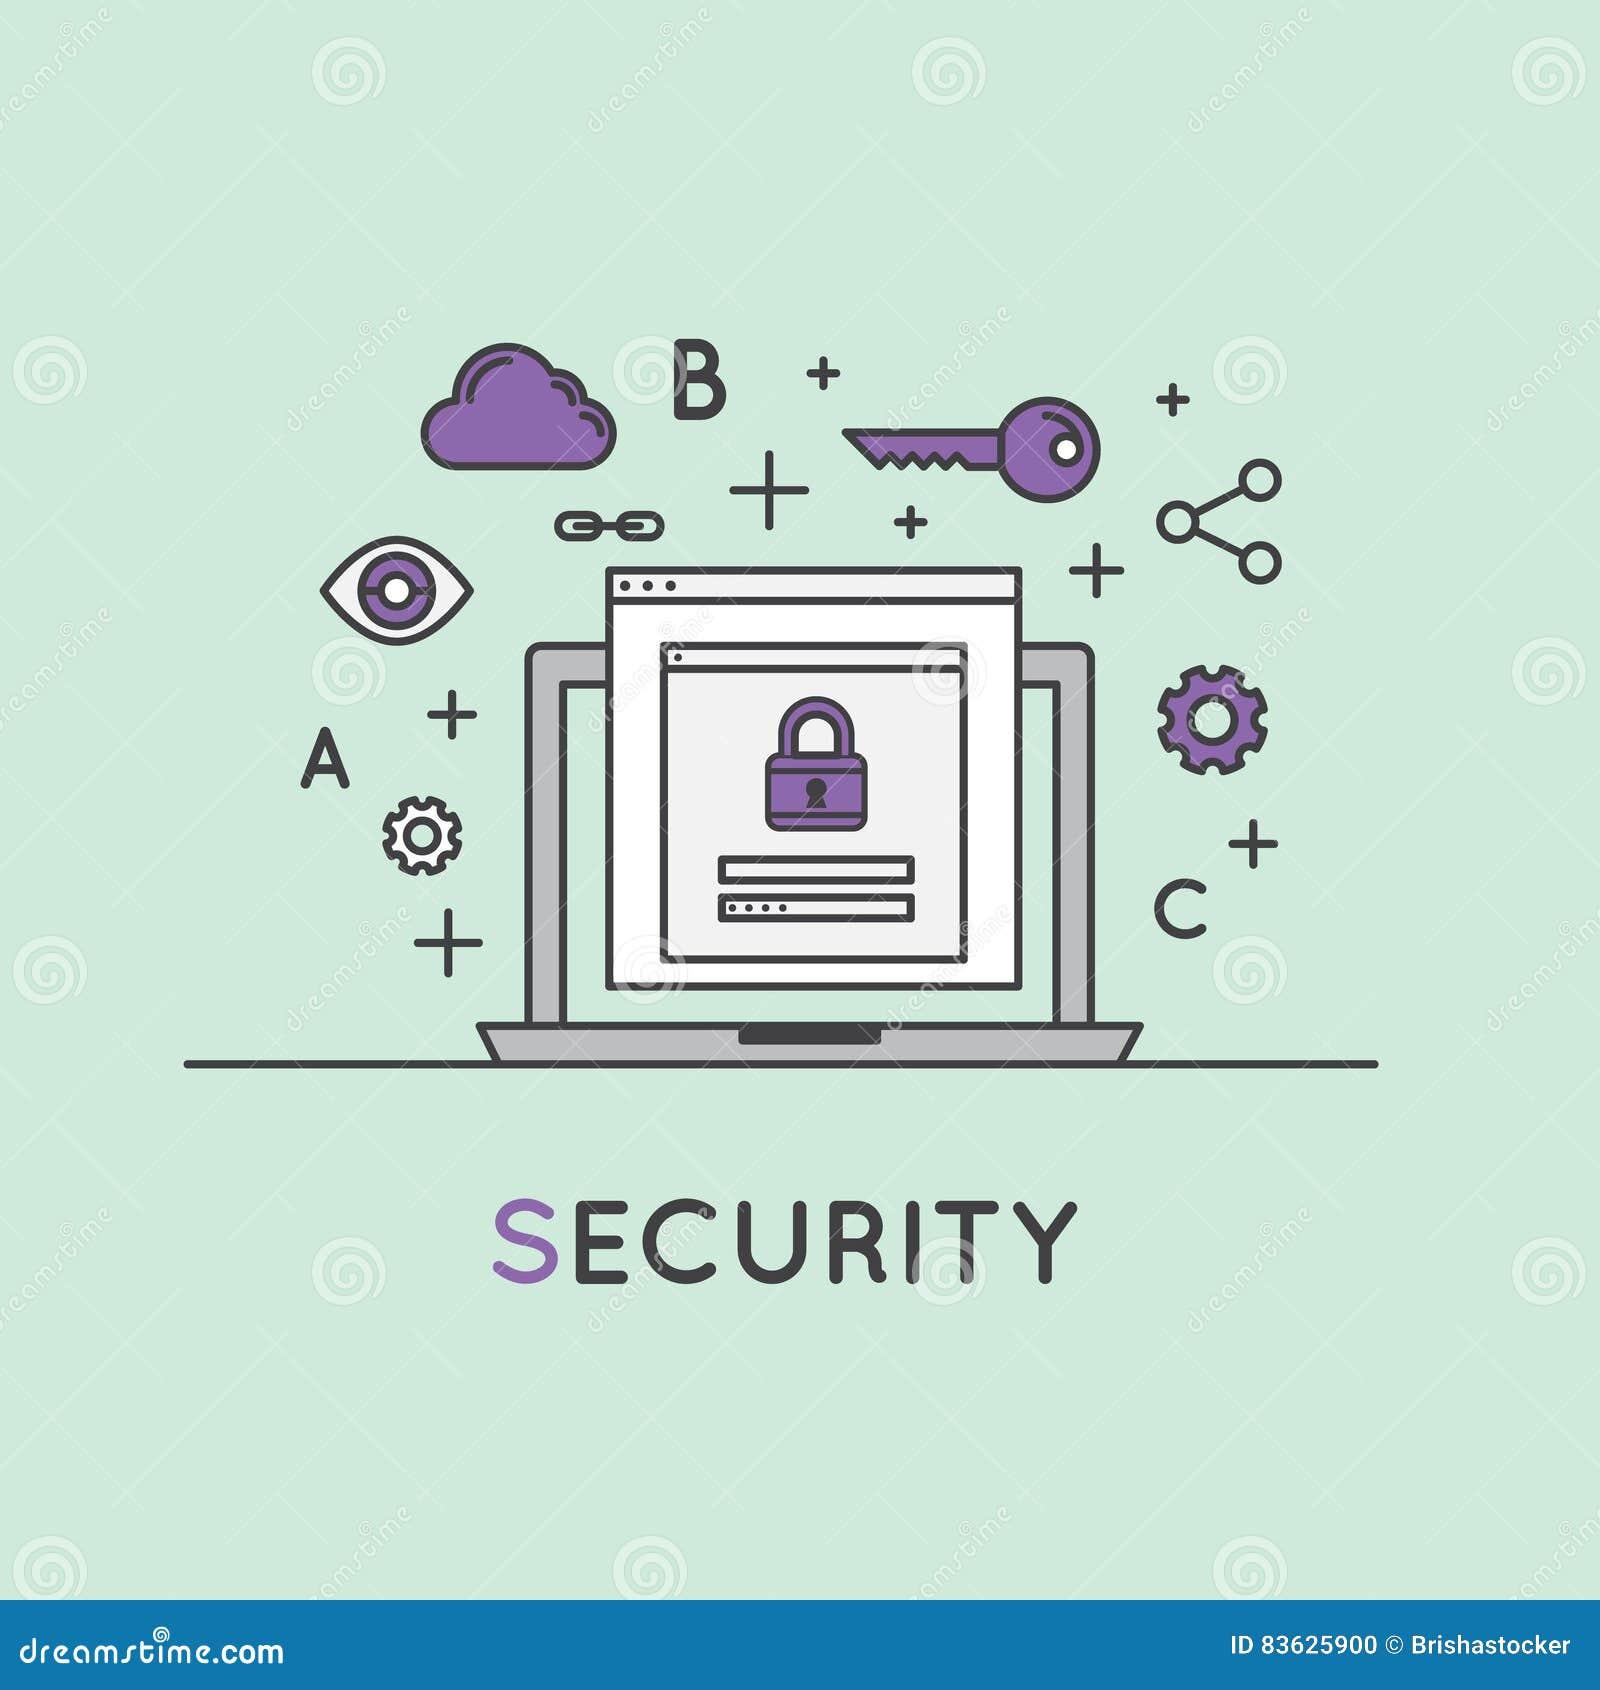 Illustration av internetsäkerhet, dataskydd, säkert datautbyte, kryptografi